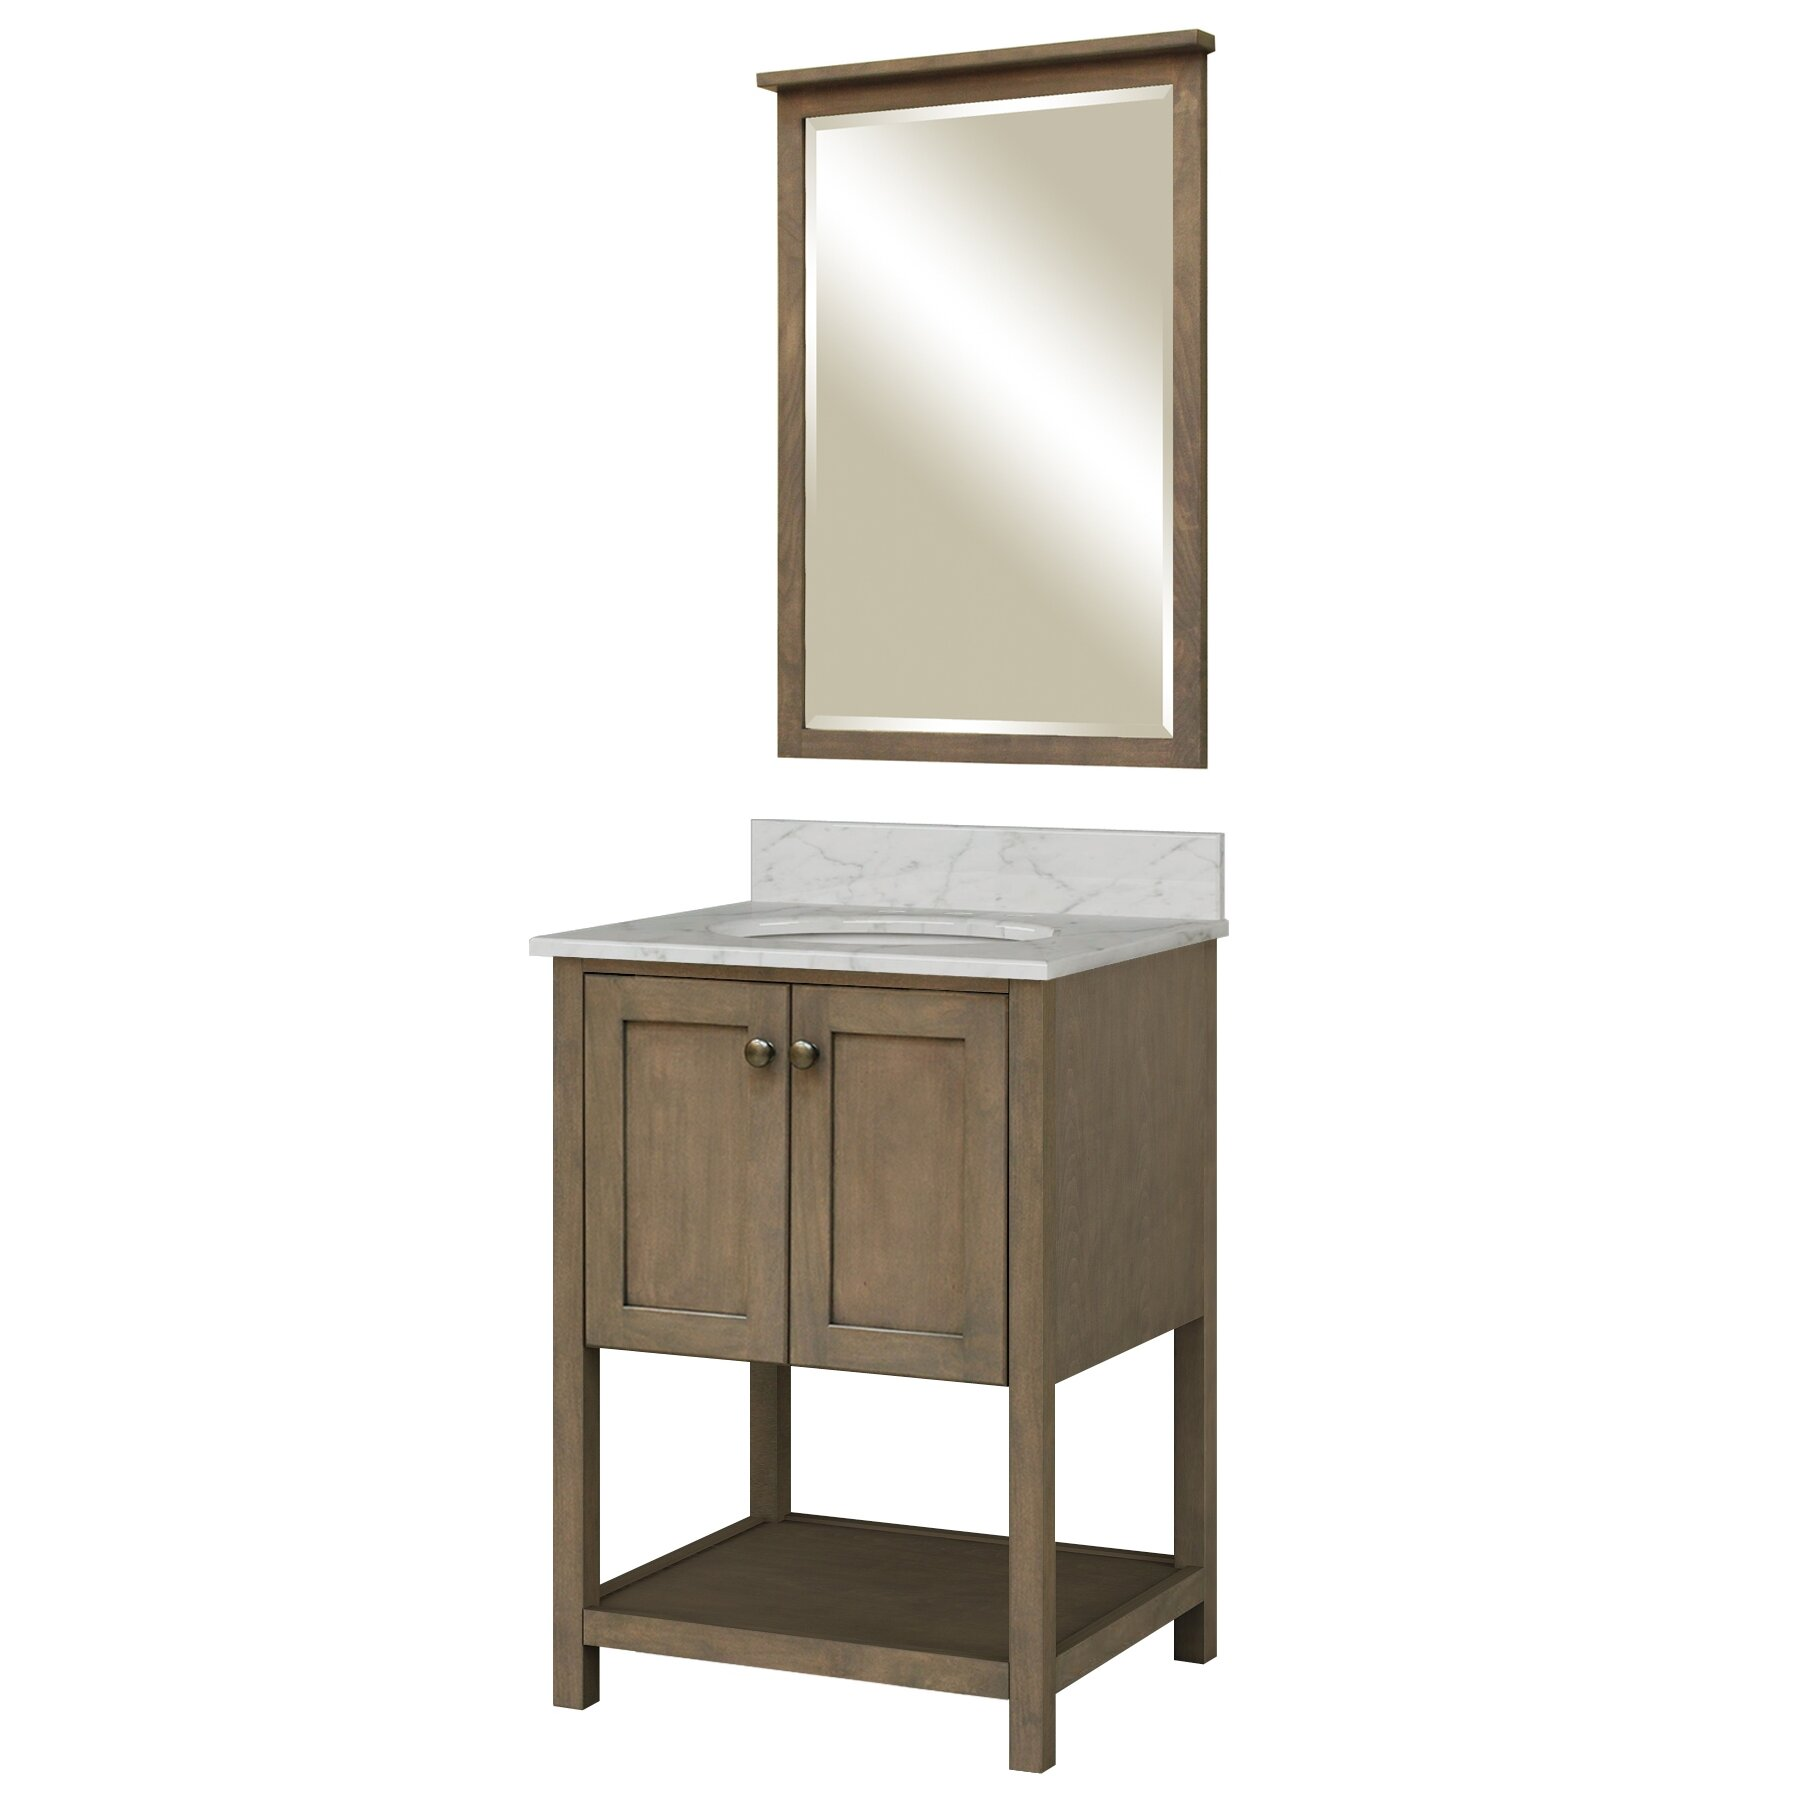 24 Bathroom Vanity 24 Quot Loft Bathroom Vanity Walnut Bathroom Vanities Ardi Bathrooms 24